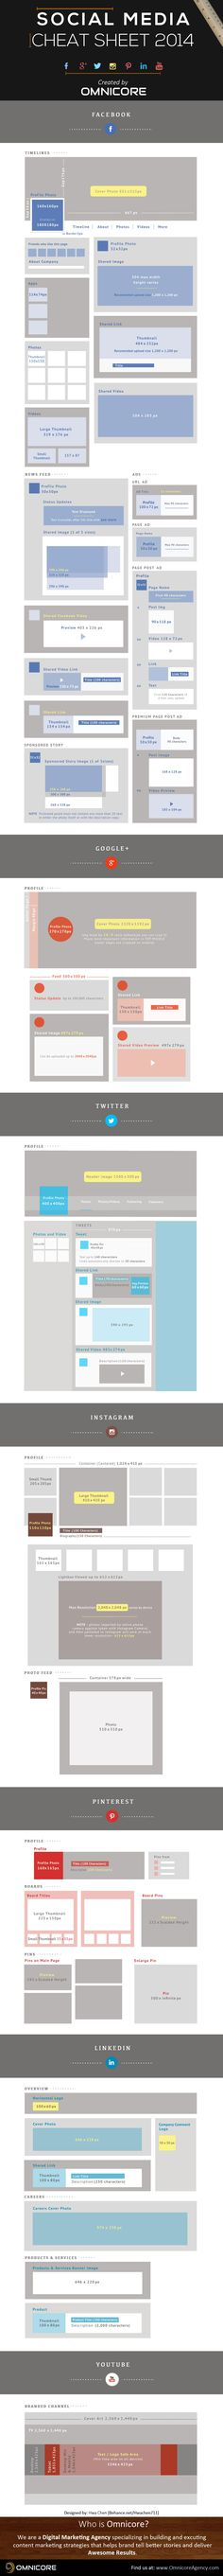 Completa Ficha (chuleta) de Social Media #infografia #infographic #socialmedia